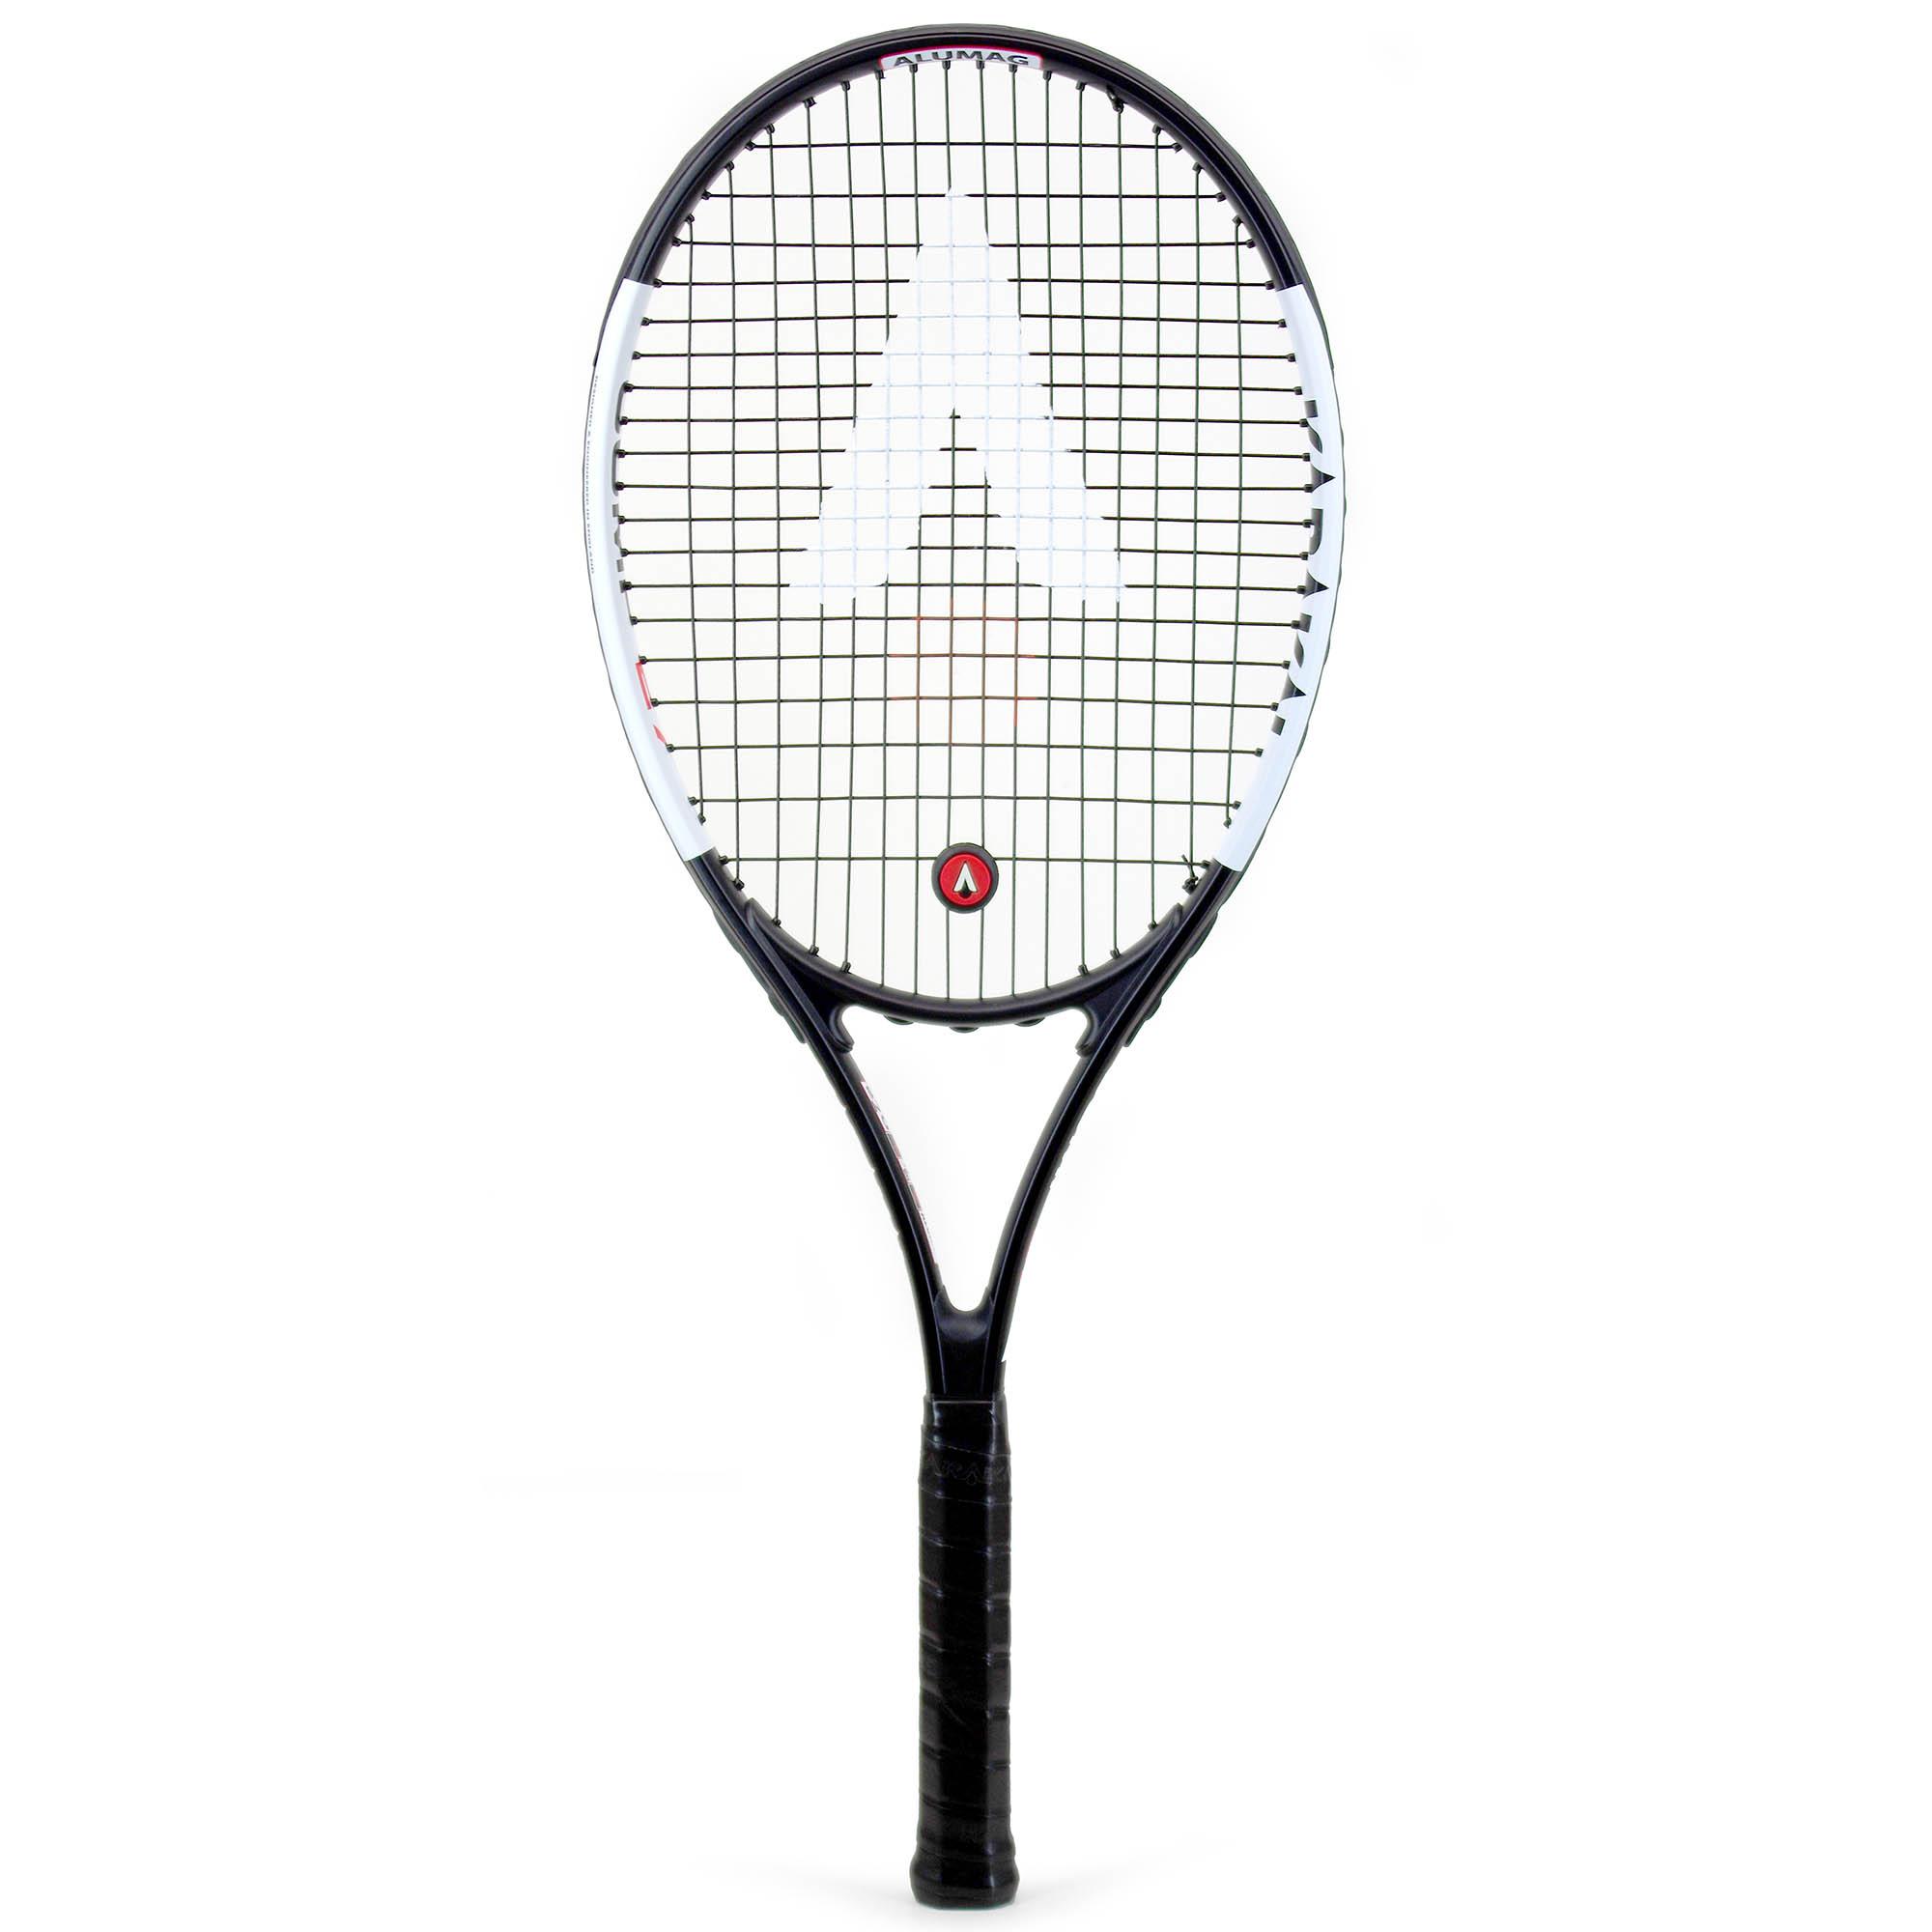 Karakal COMP 27 Tennis Racket - Grip 2